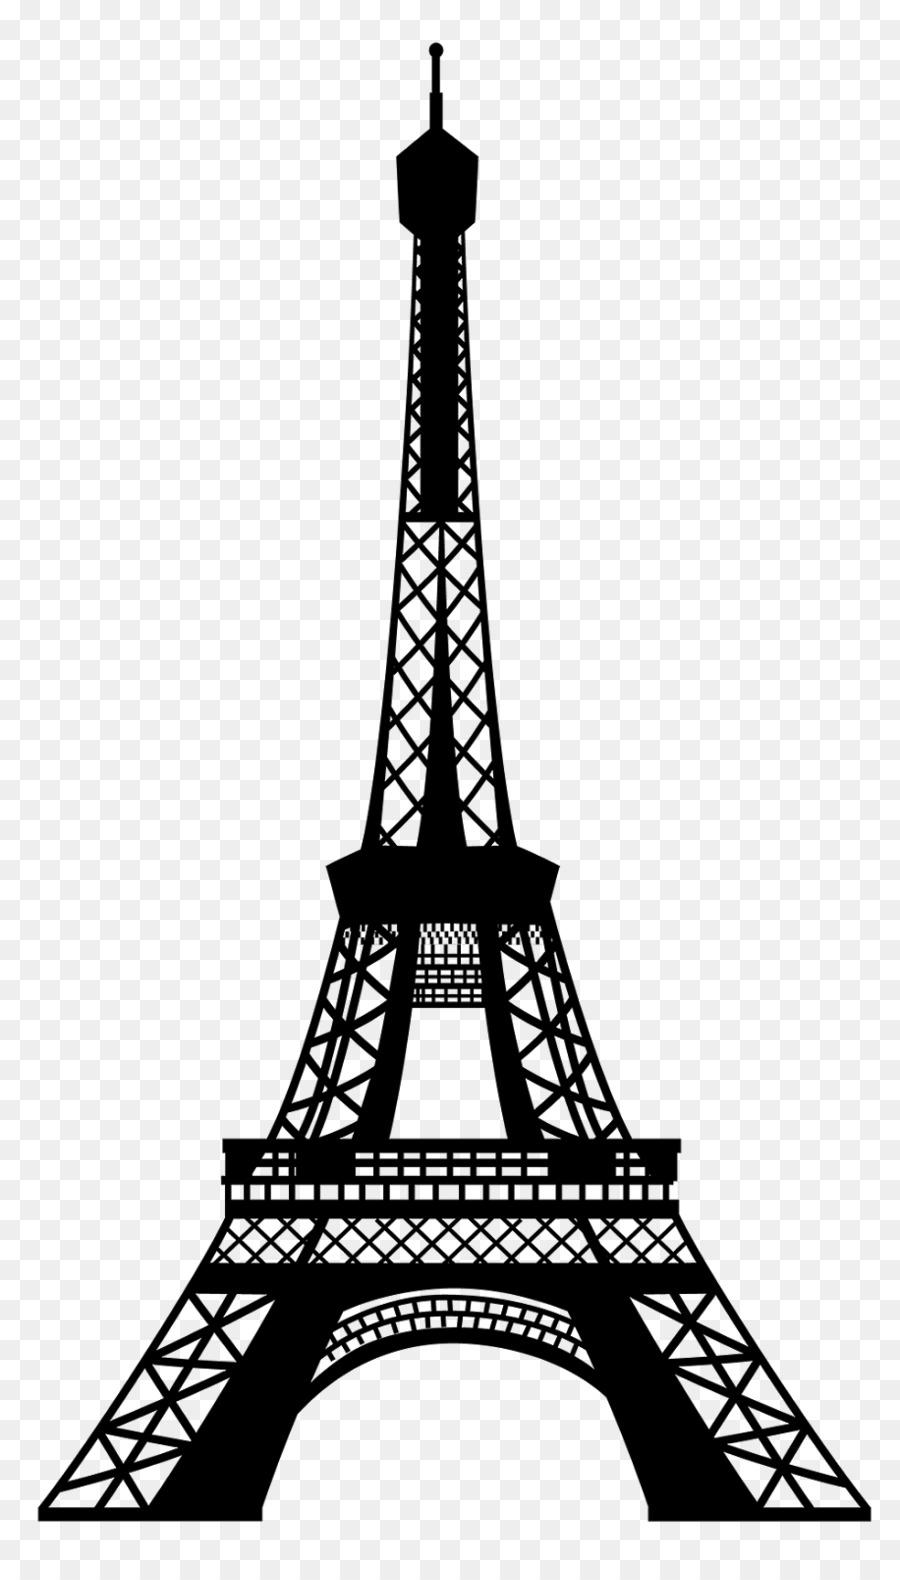 Descarga gratuita de Eiffel, Champ De Mars, Exposition Universelle imágenes PNG